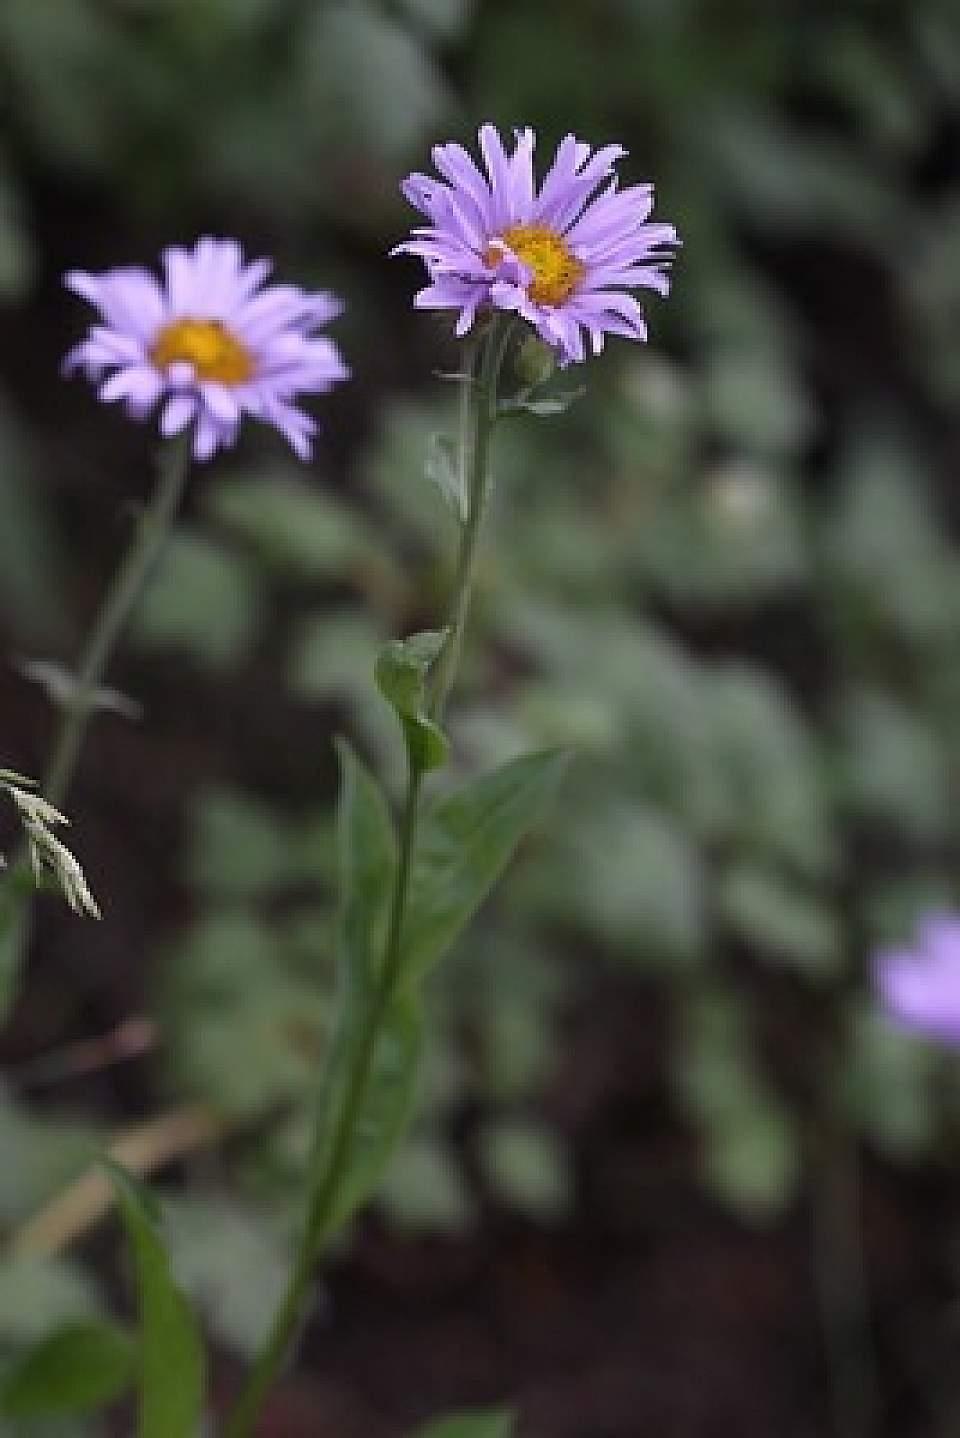 Subalpine daisy coastal fleabane Erigeron peregrinus Andrey Zharkikh Flickr 6338715470 5c589d3d8e w